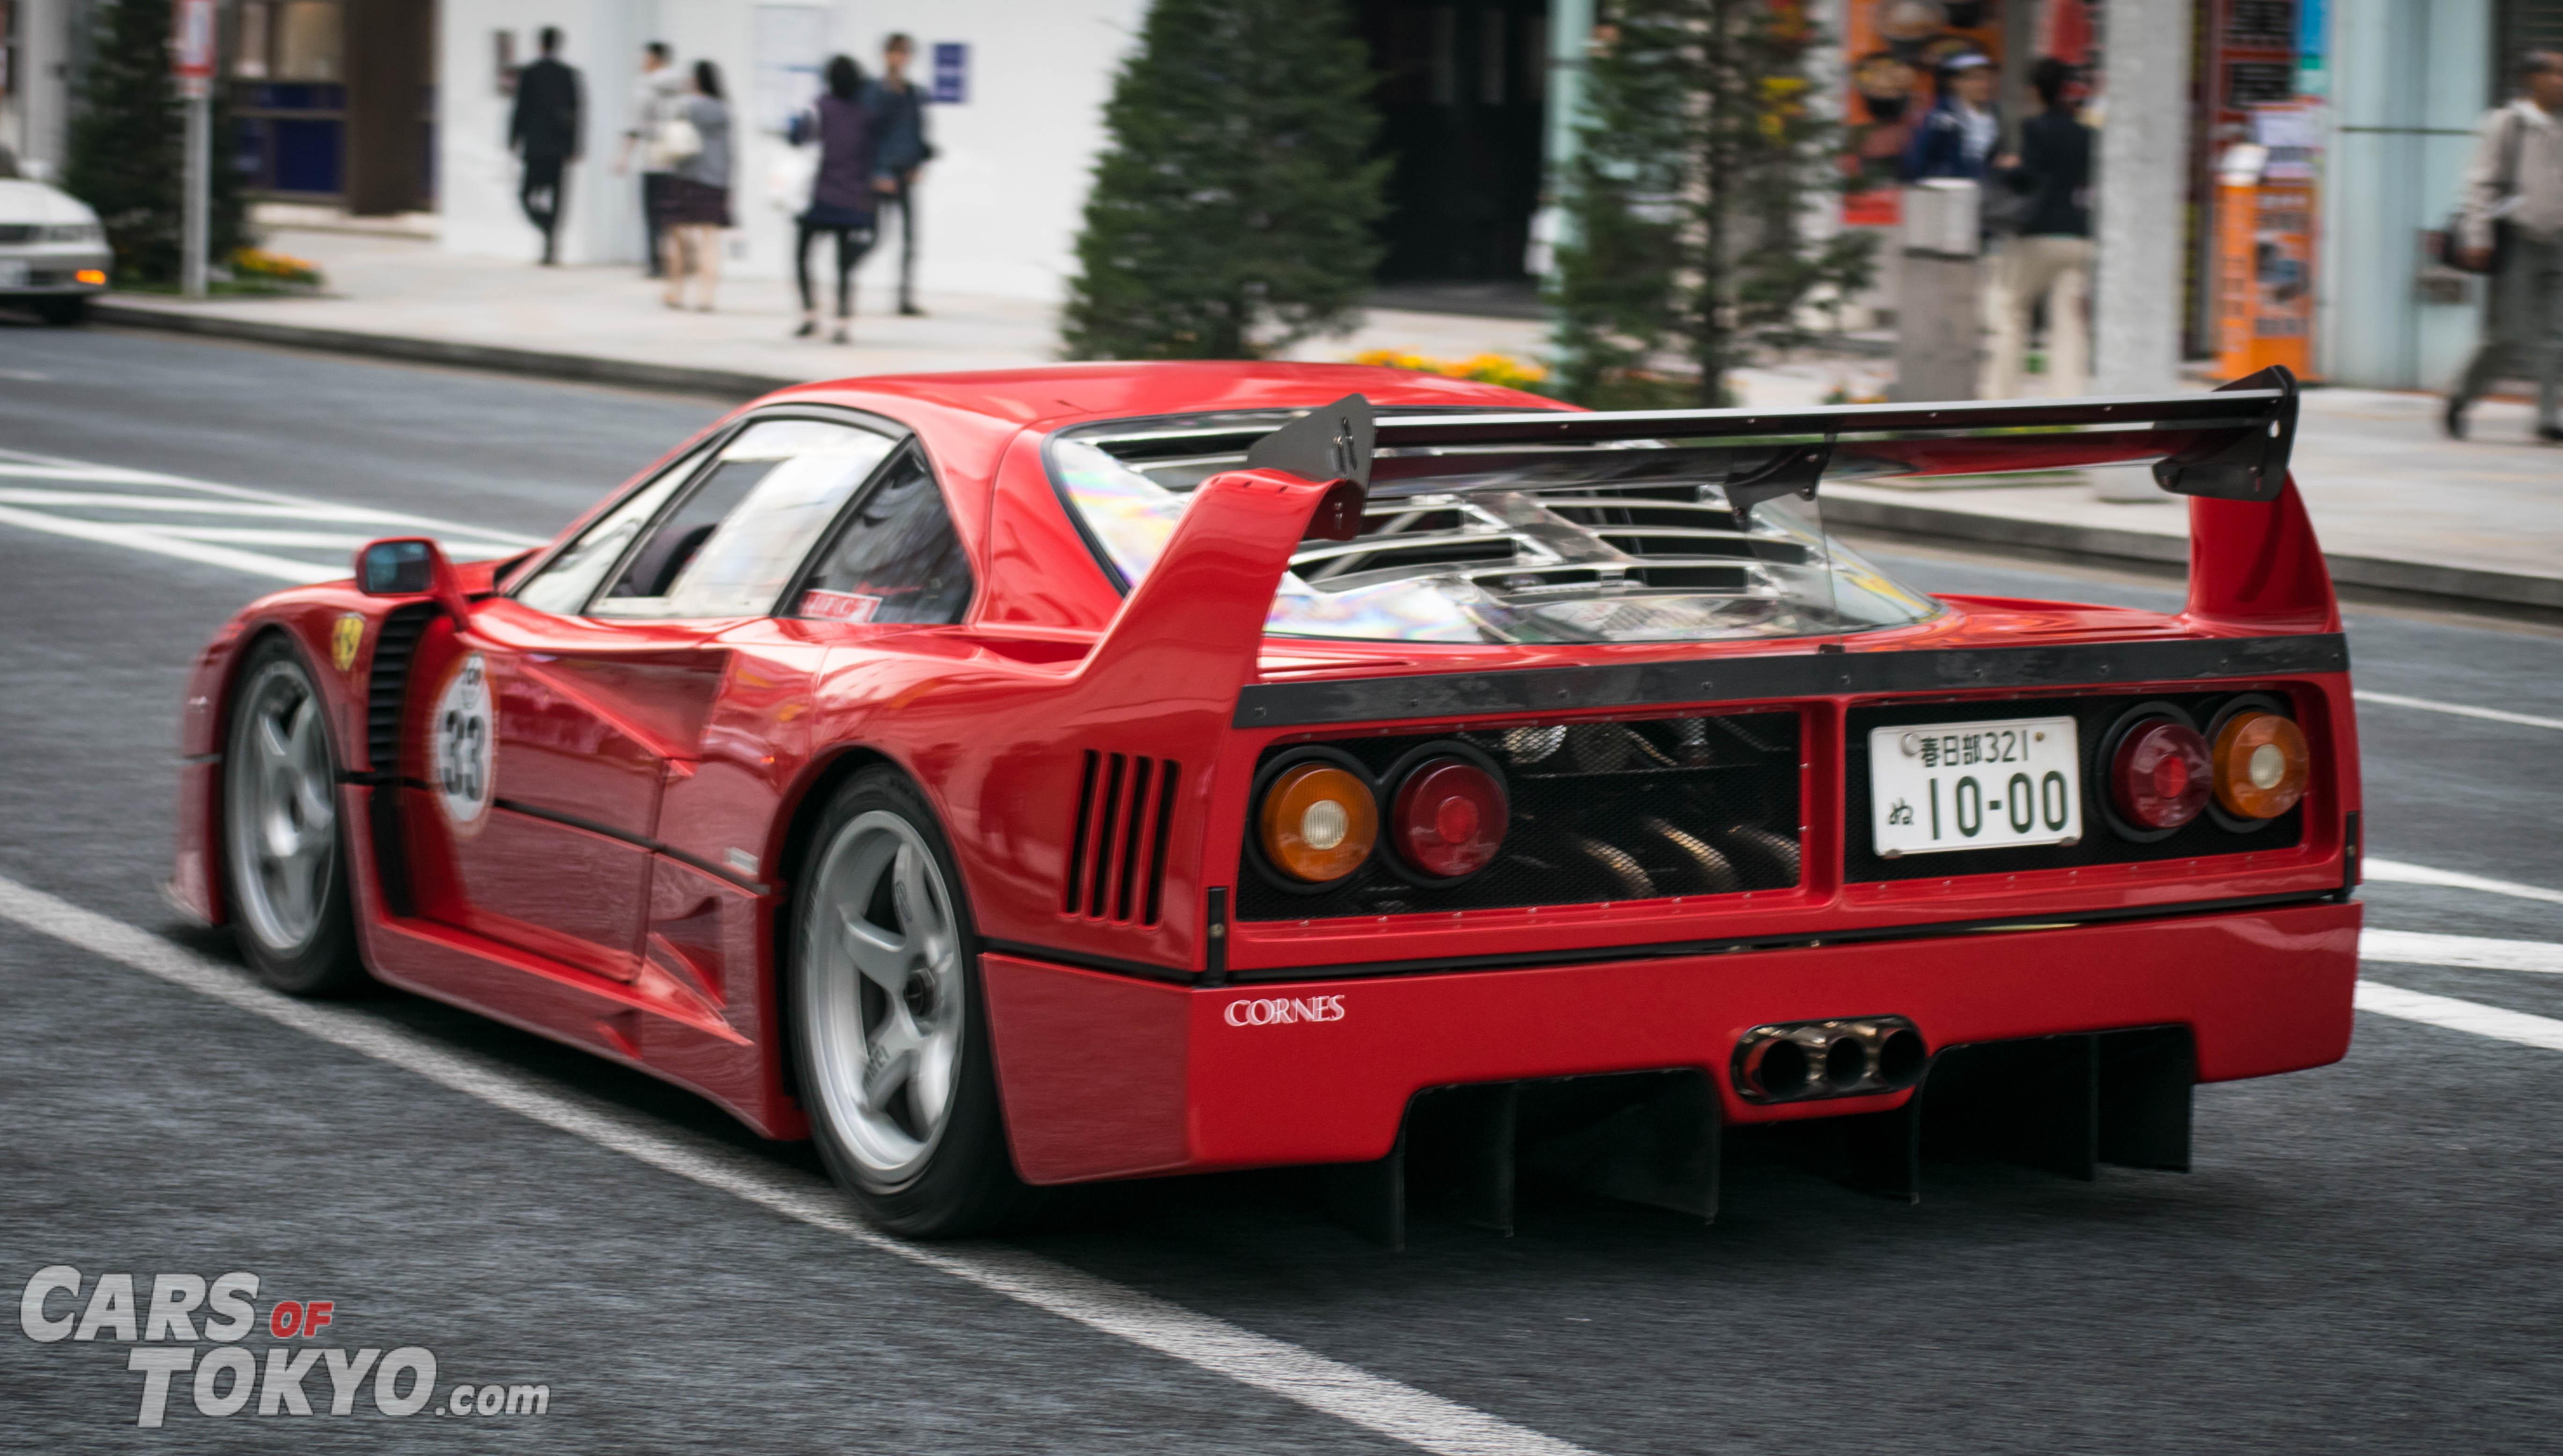 Cars of Tokyo Ginza Ferrari F40